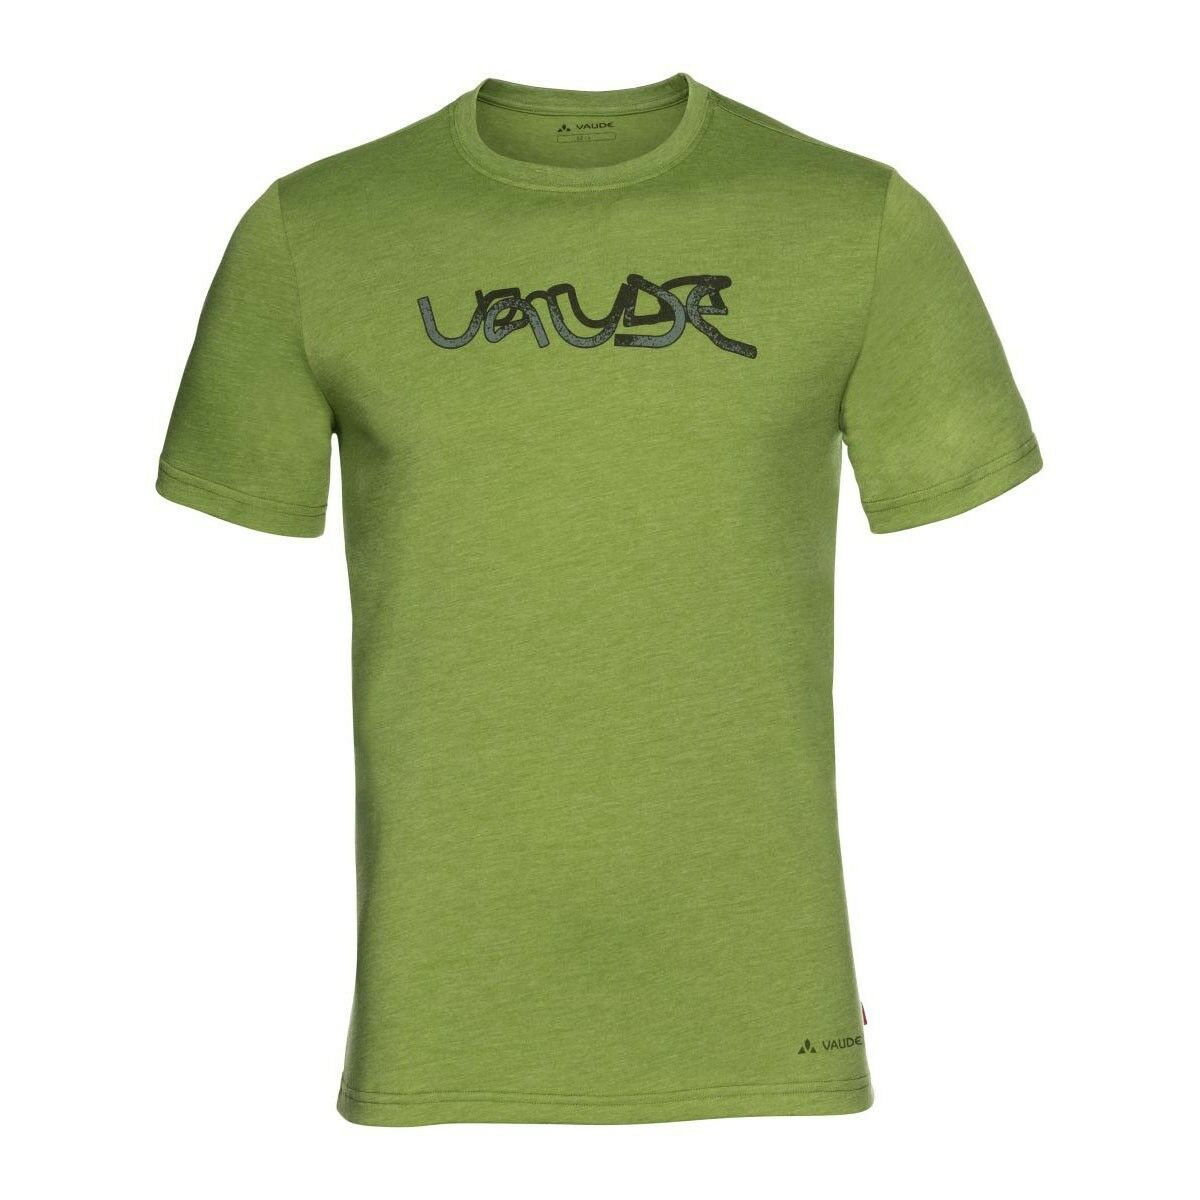 Vaude Vaude Vaude Cyclist t-shirt III función camisa verde 54a8f1